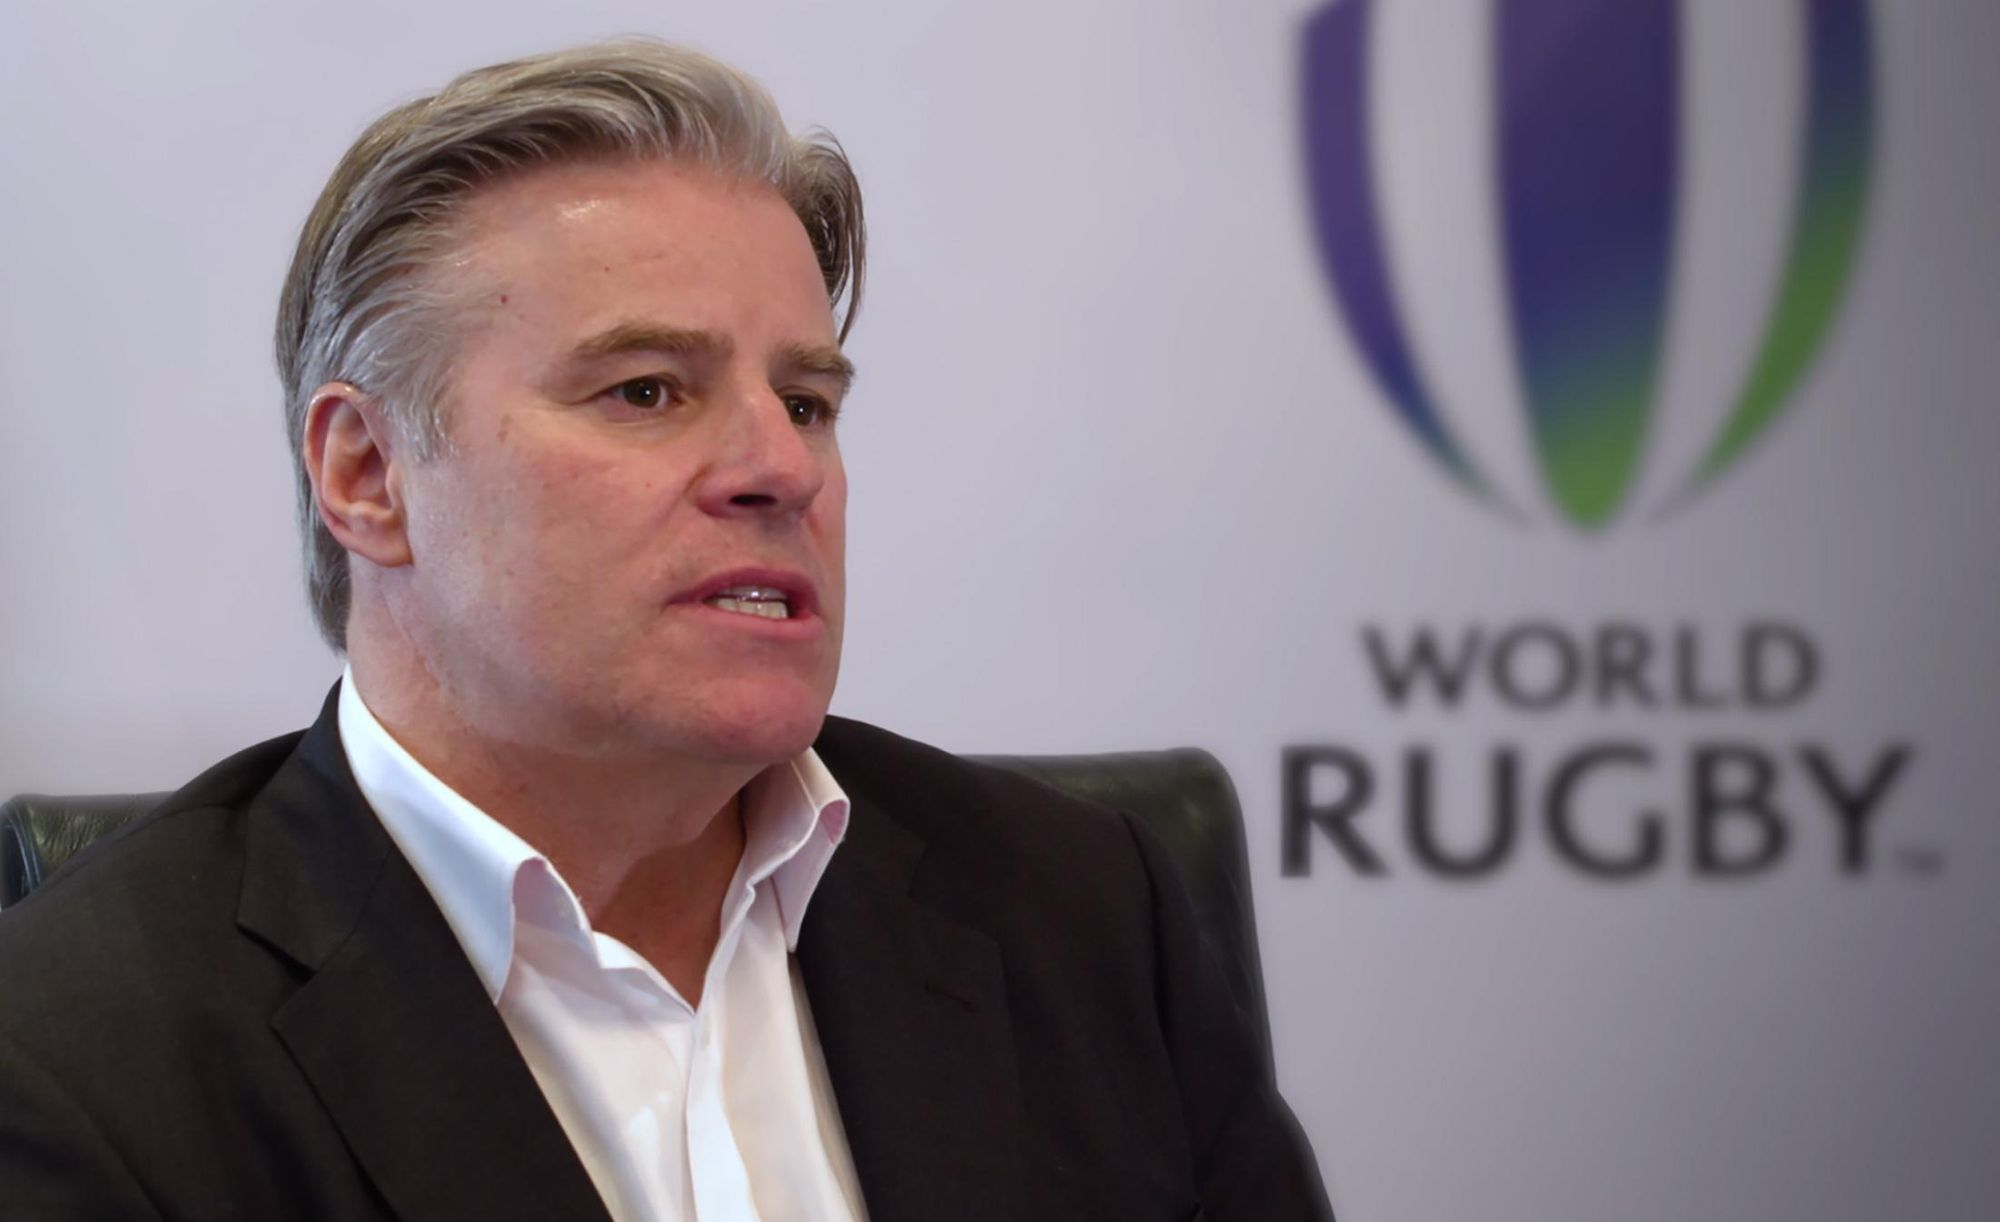 World Rugby, Gosper